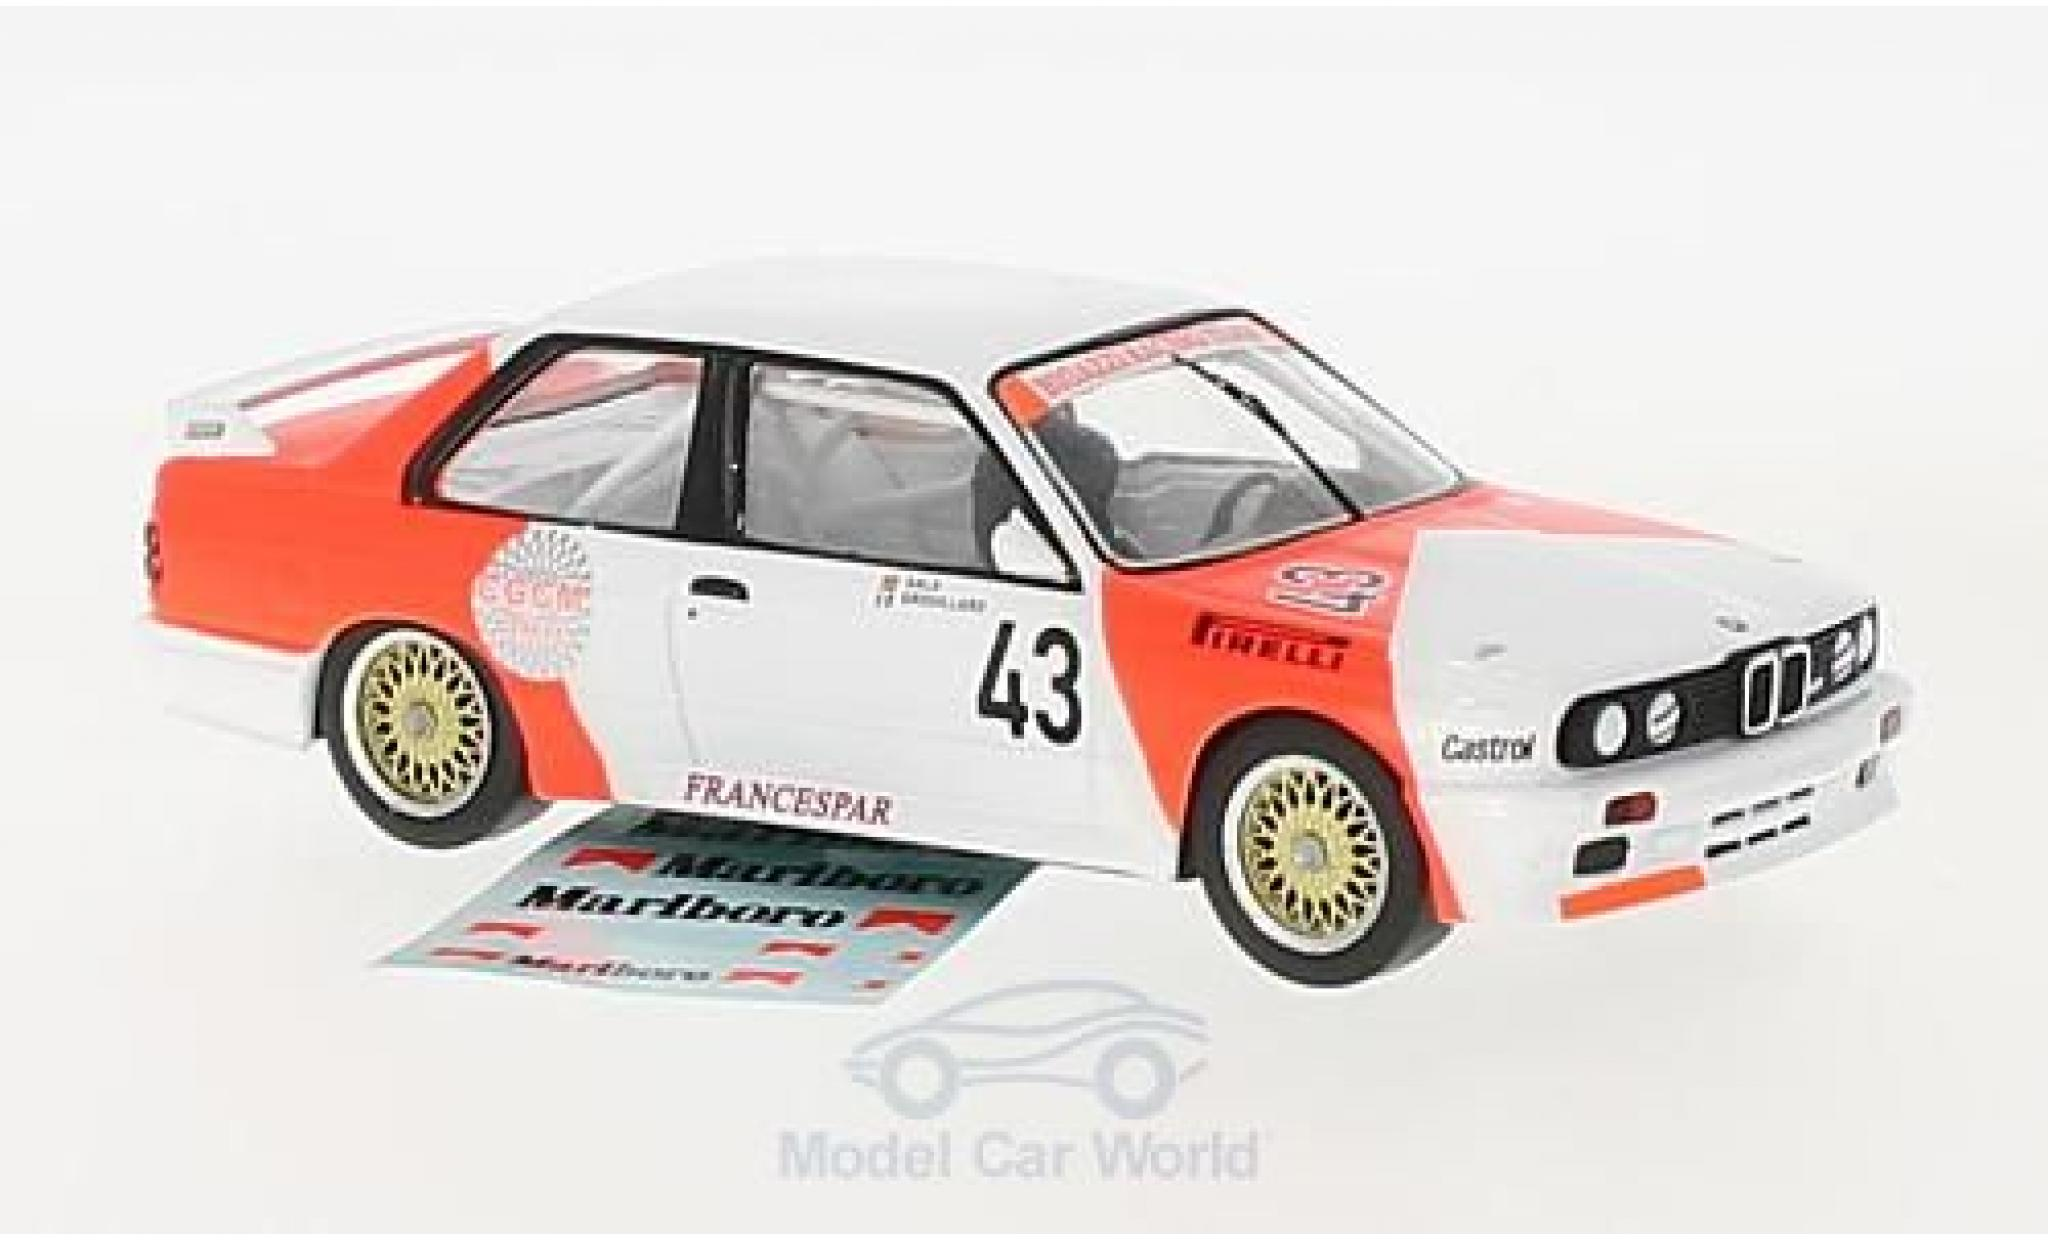 Bmw M3 E30 1/43 IXO BMW (E30) No.43 Bigazzi Racing Team Marlboro WTCC 1987 mit Decals L.-P.Sala/O.Grouillard